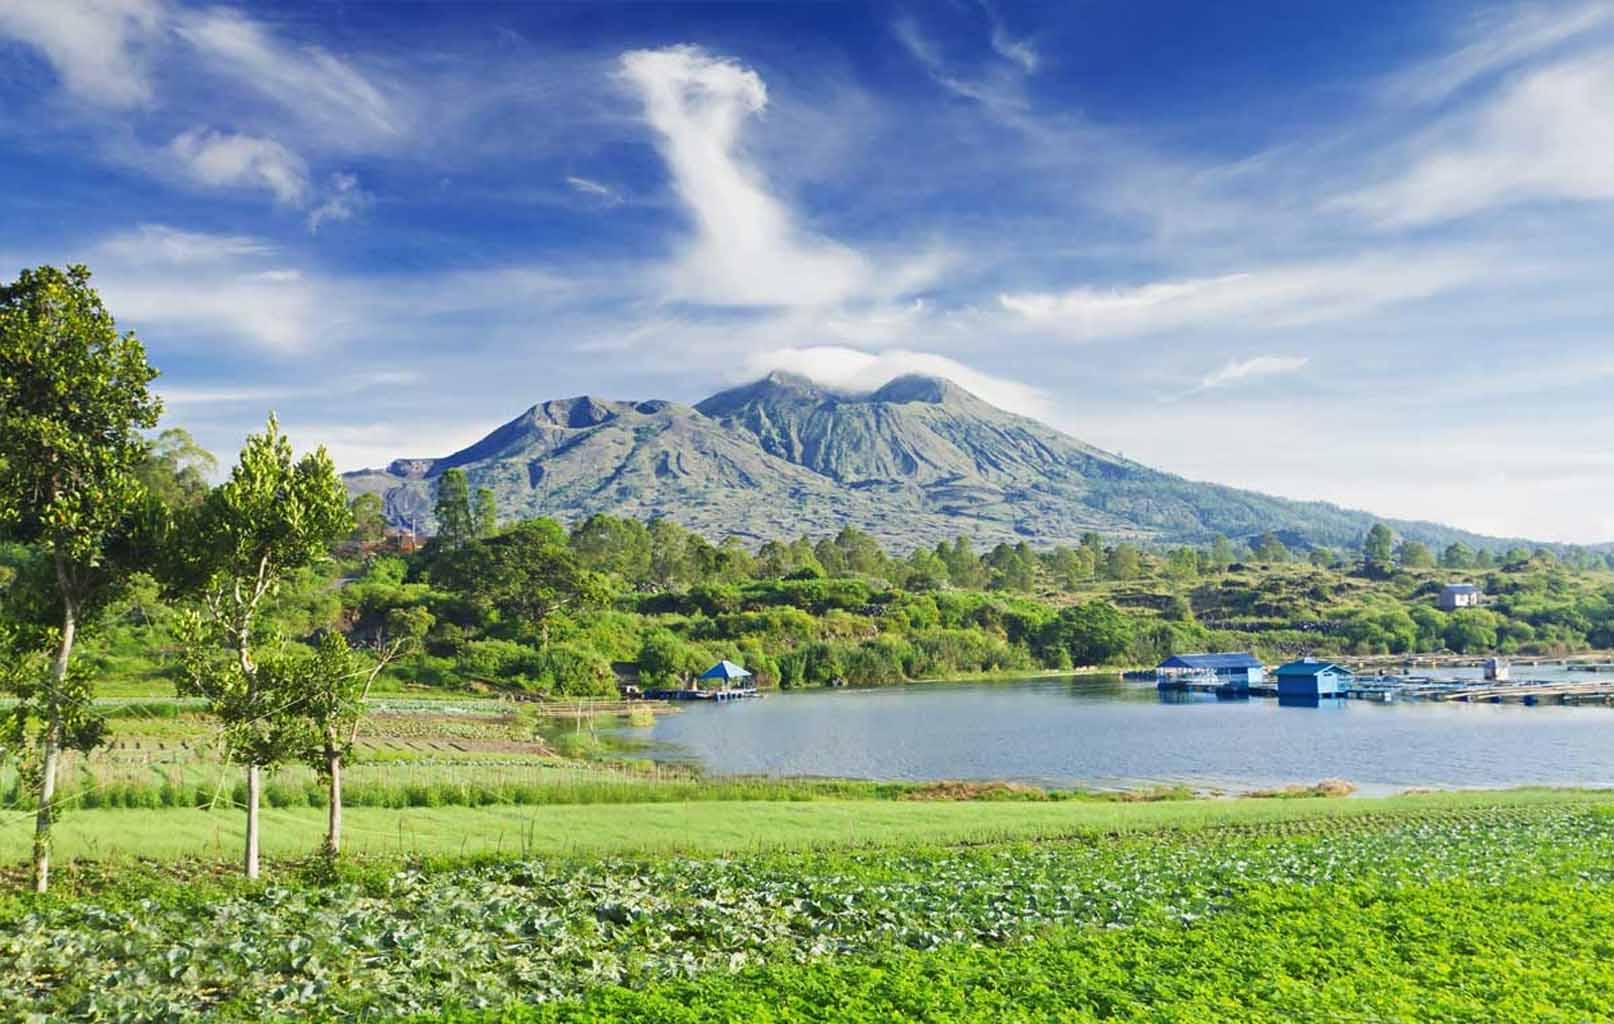 Khu du lịch Kintamani Volcano